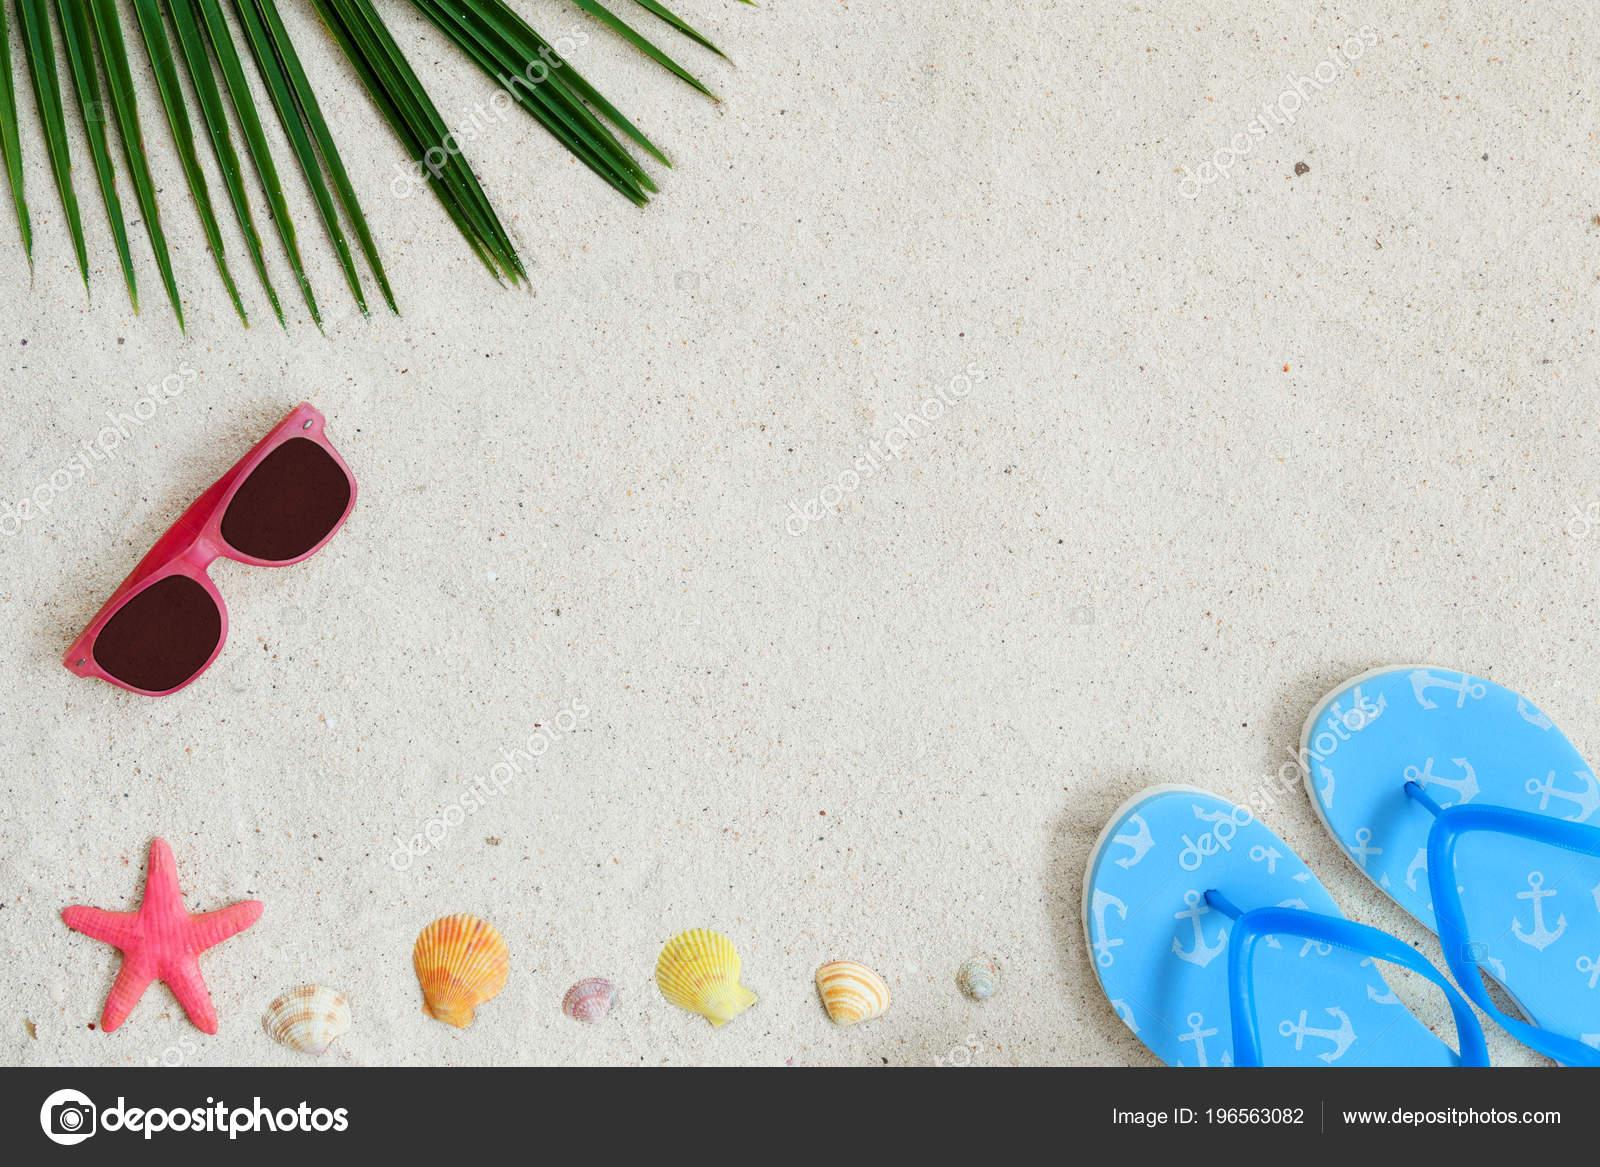 b7bff047e9228 Beach Background Top View Beach Sand Coconut Leaves Sunglasses ...